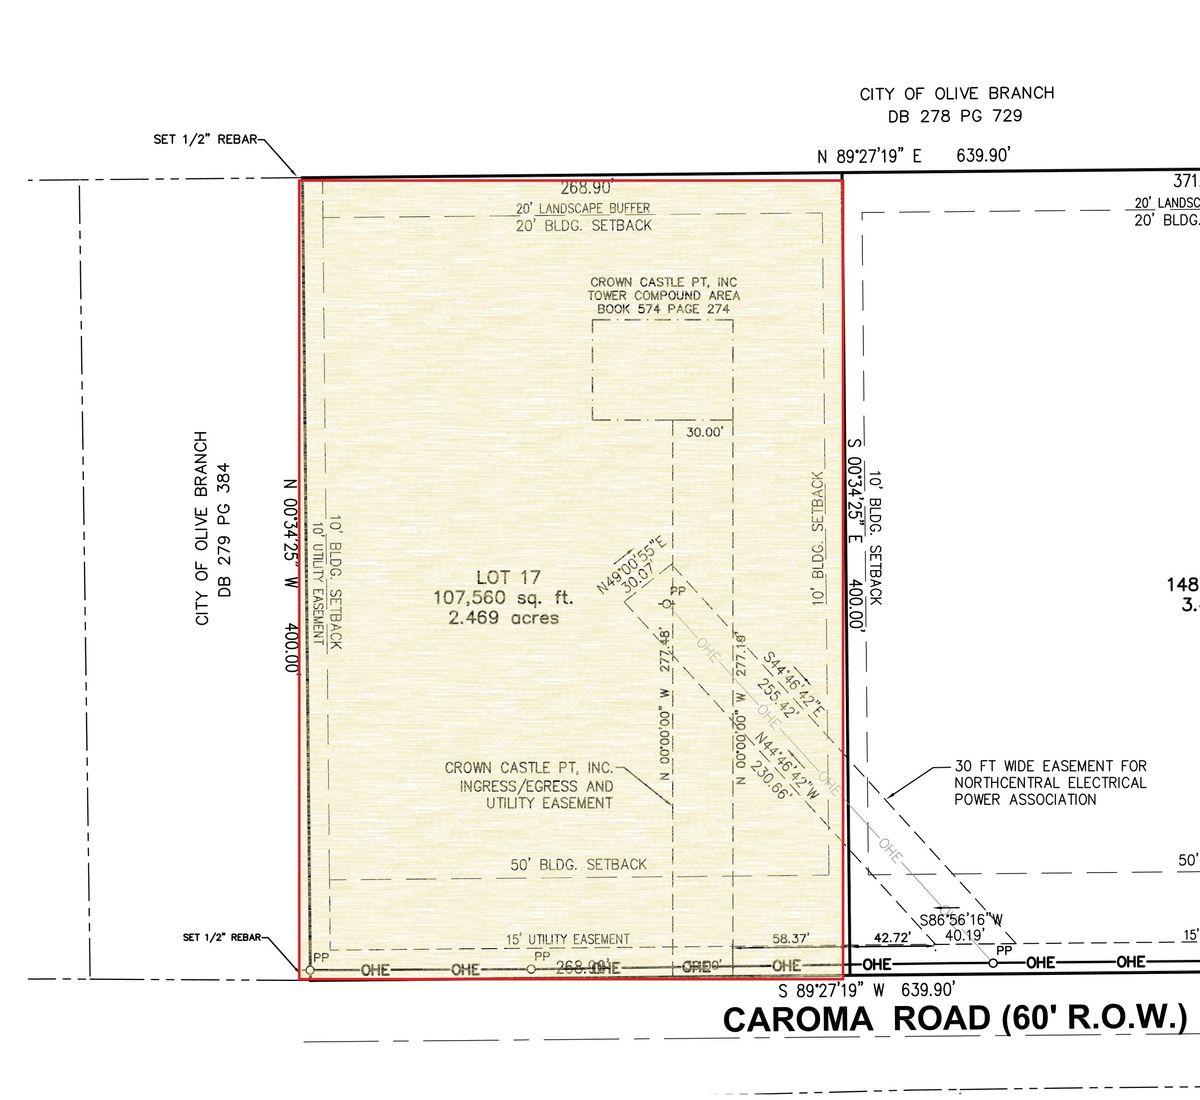 8806 Caroma Rd, Olive Branch, MS